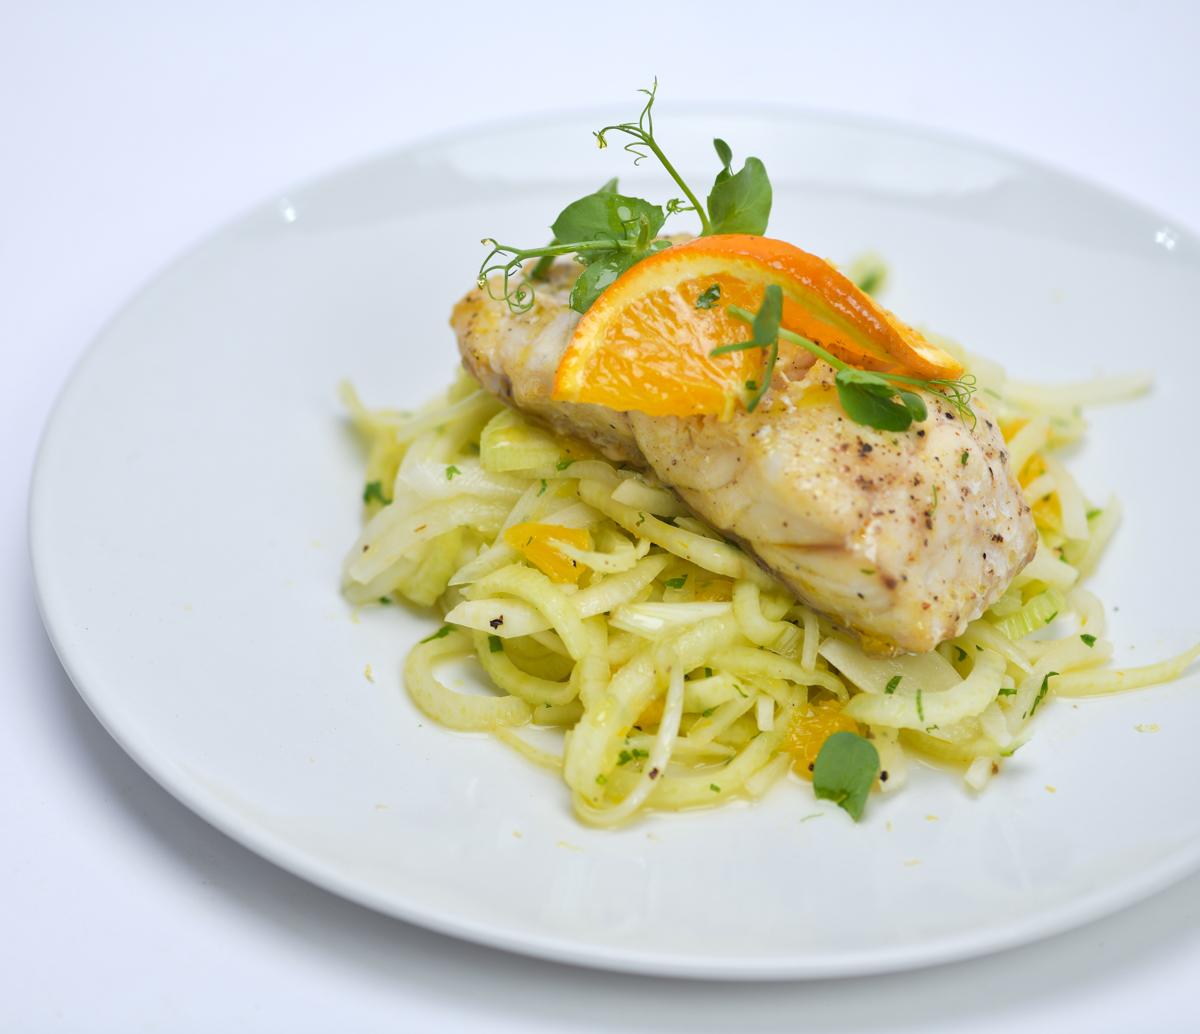 Hamour orange with Salad